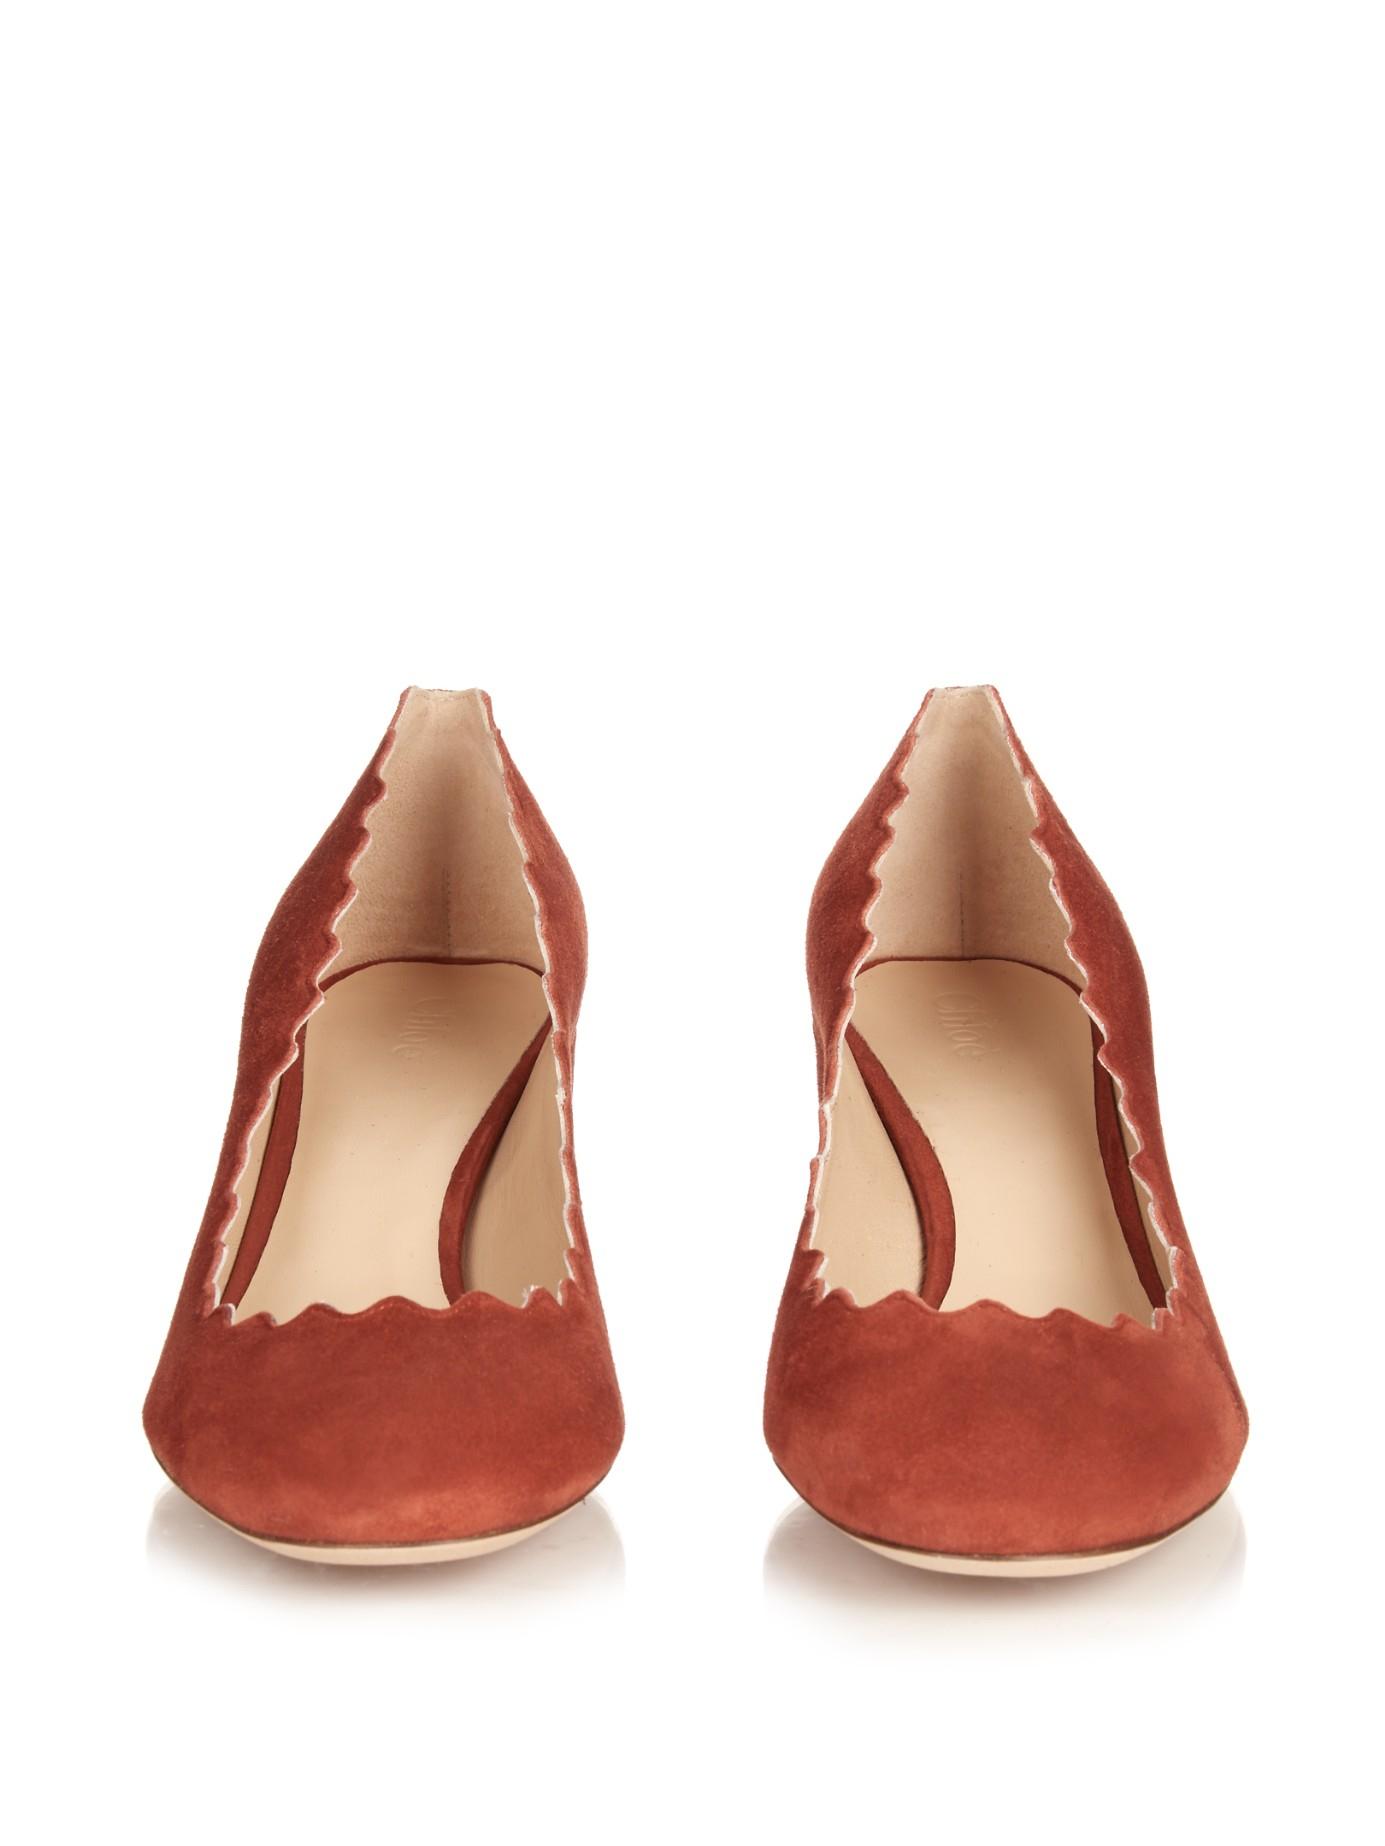 fccb631cbb6ad Lyst - Chloé Lauren Scallop-edged Block-heel Suede Pumps in Red